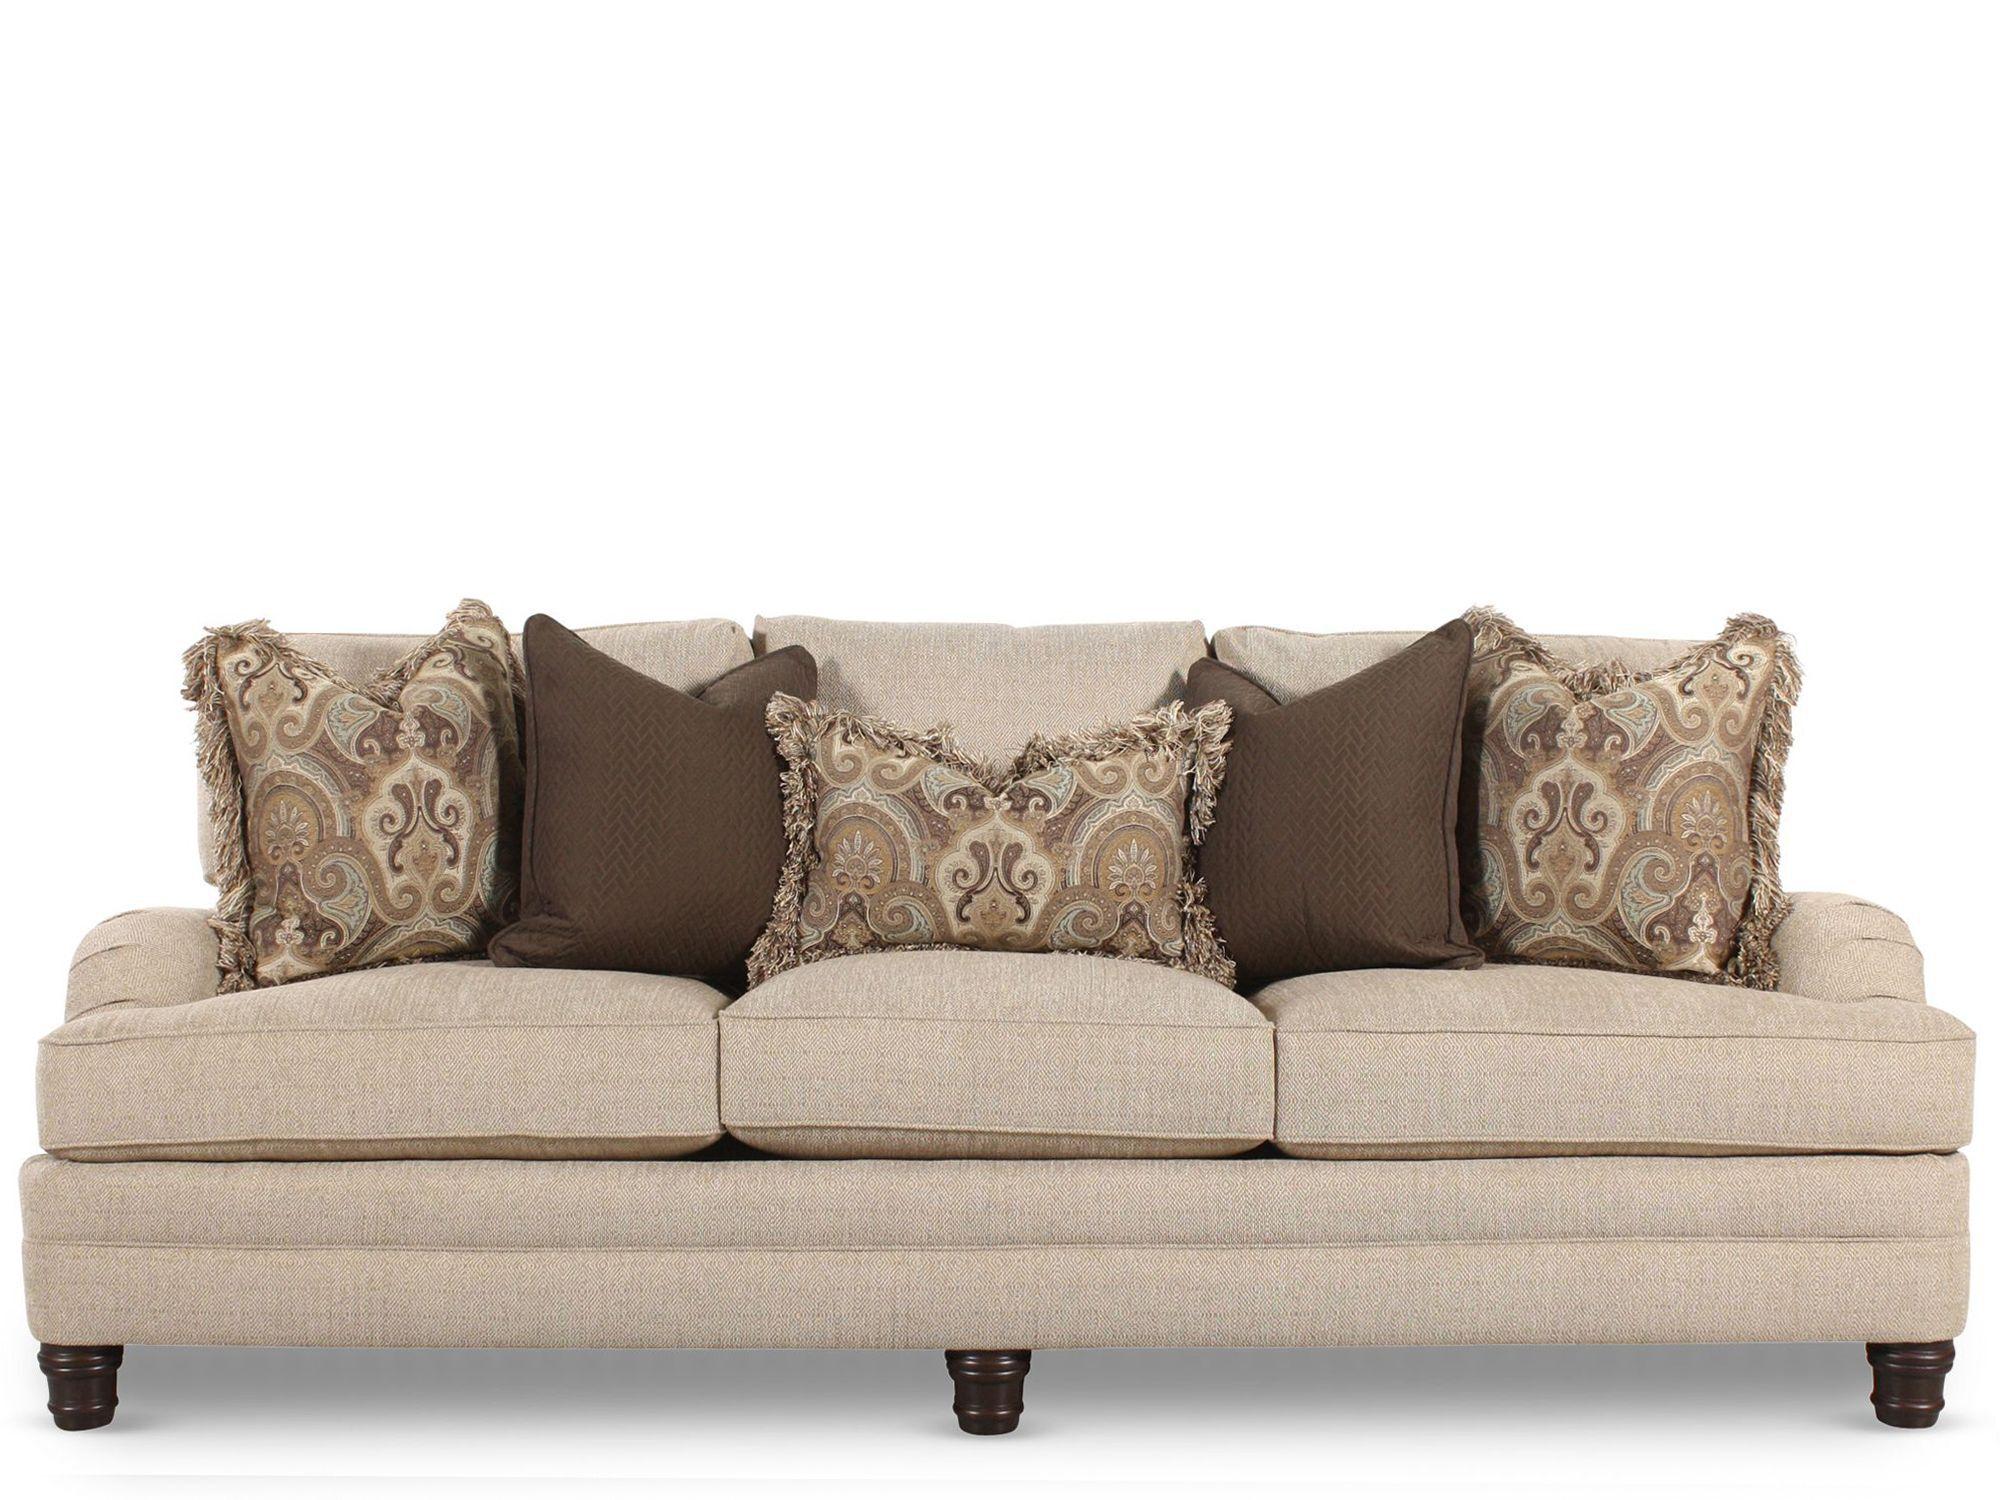 bernhardt sofas cute sofa pillows tarleton mathis brothers furniture